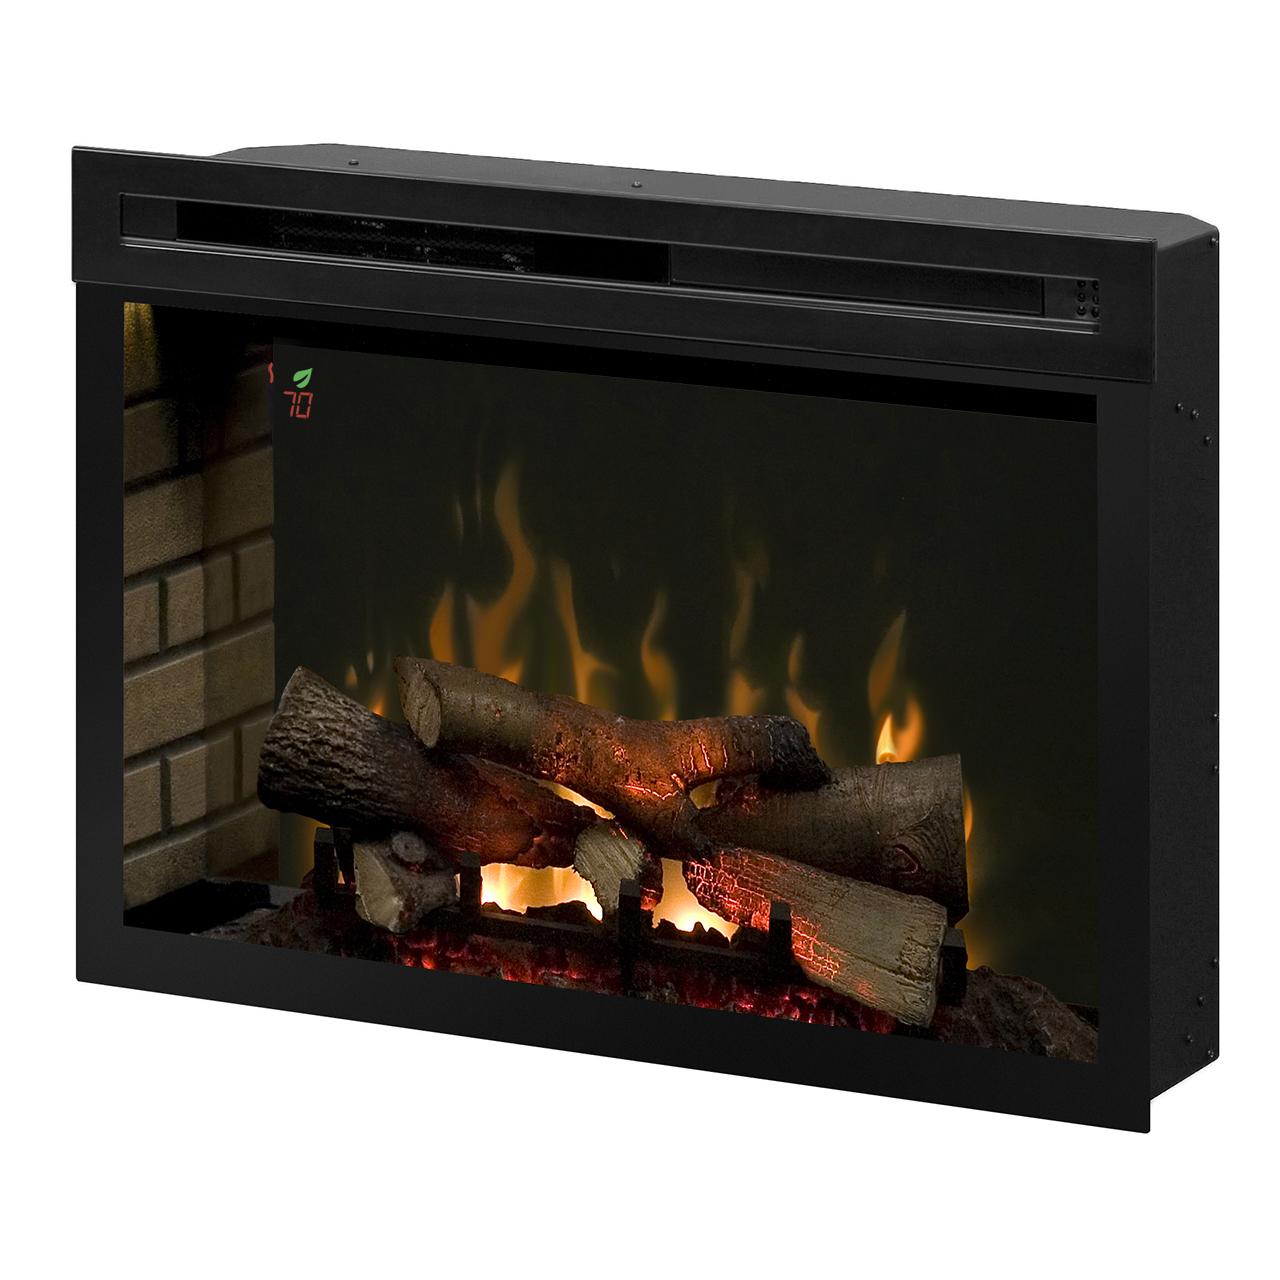 Dimplex 33 Multi Fire Xd Electric Firebox Pf Hl